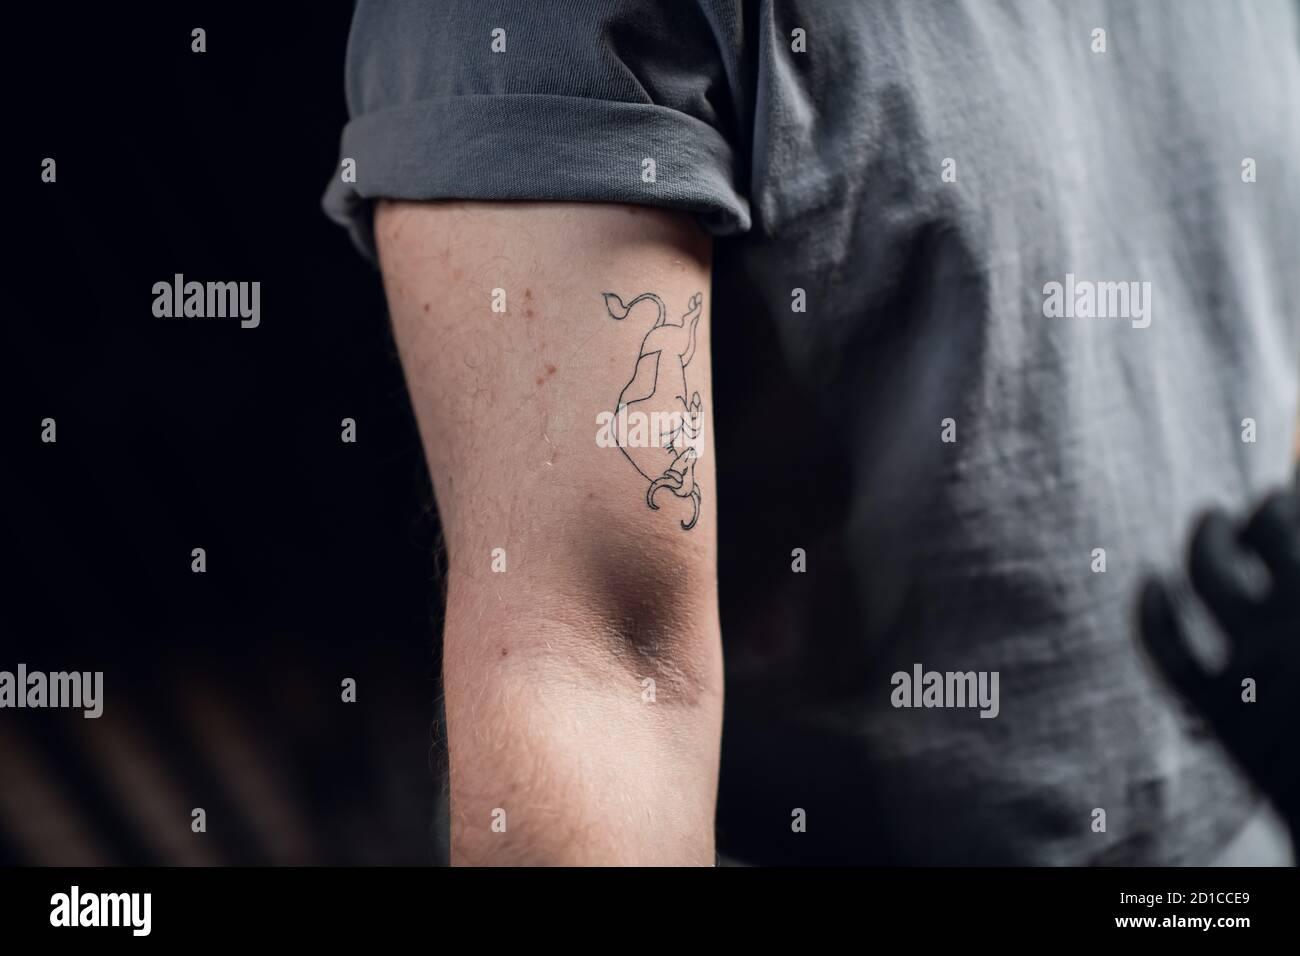 Tatuaje De Toro Fotos E Imágenes De Stock Alamy